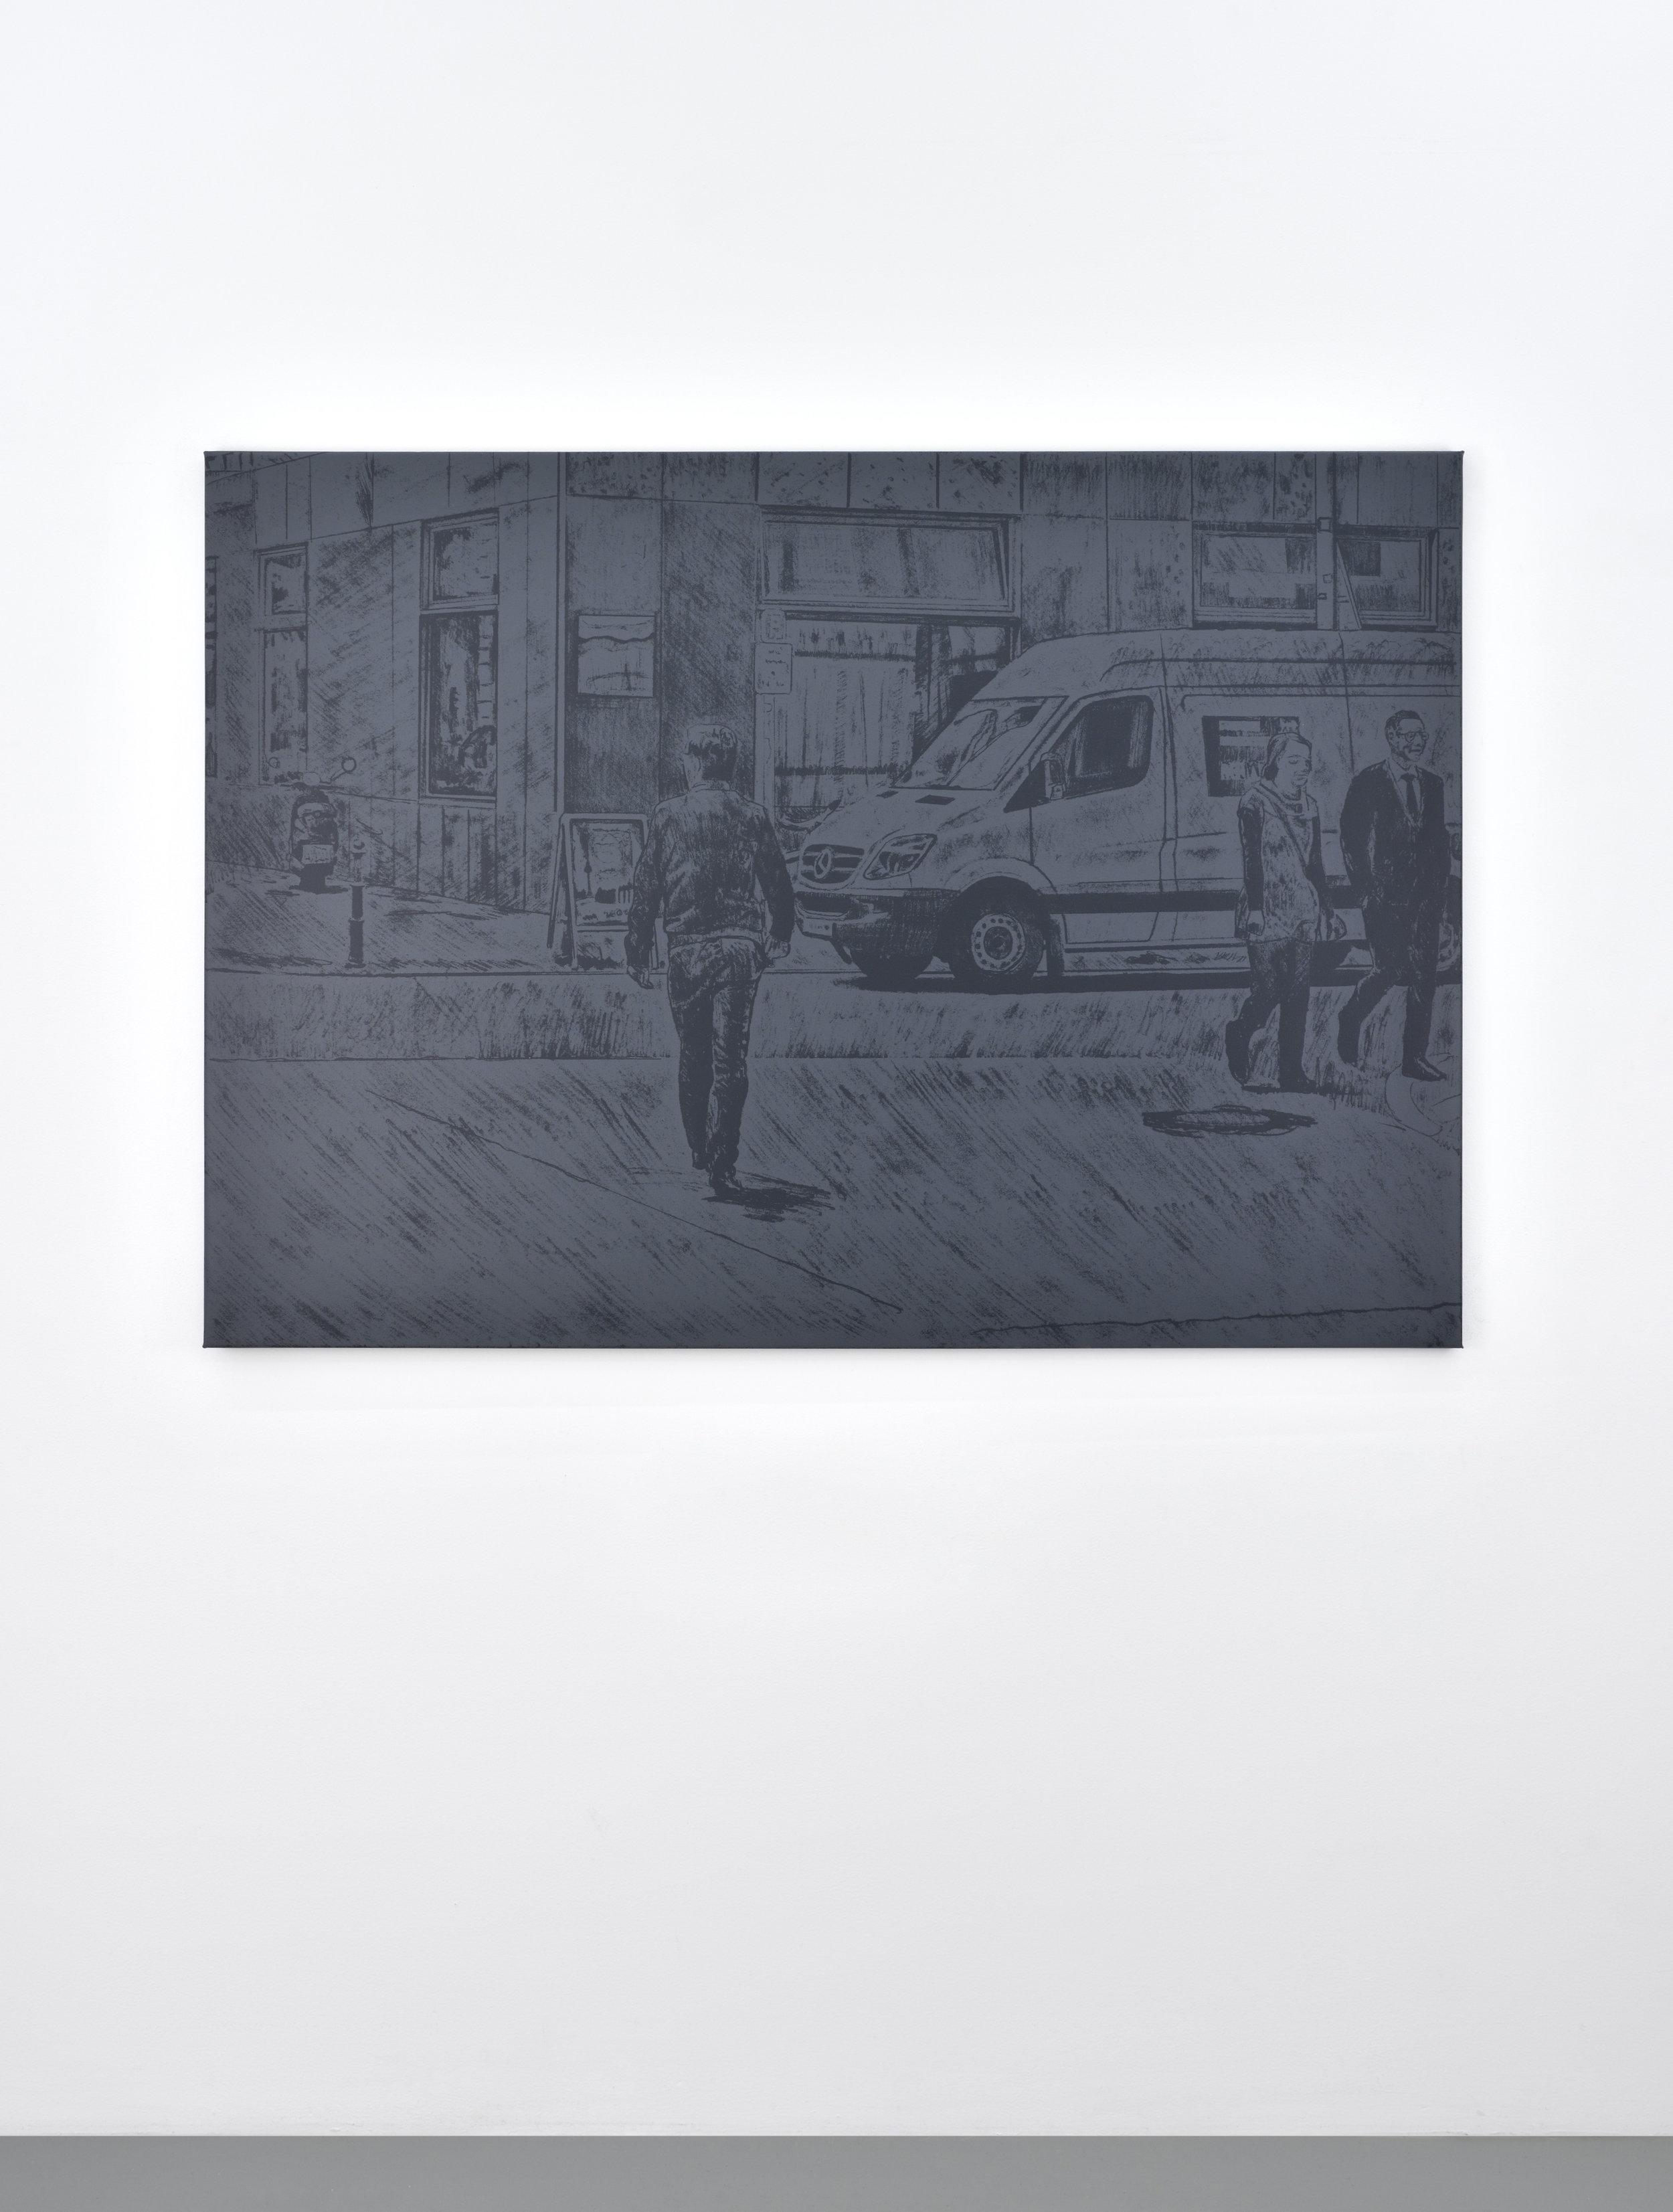 Untitled (van), 2017 silkscreen on canvas 106,7 x 149,2 cm - 42 x 58 3/4 inches